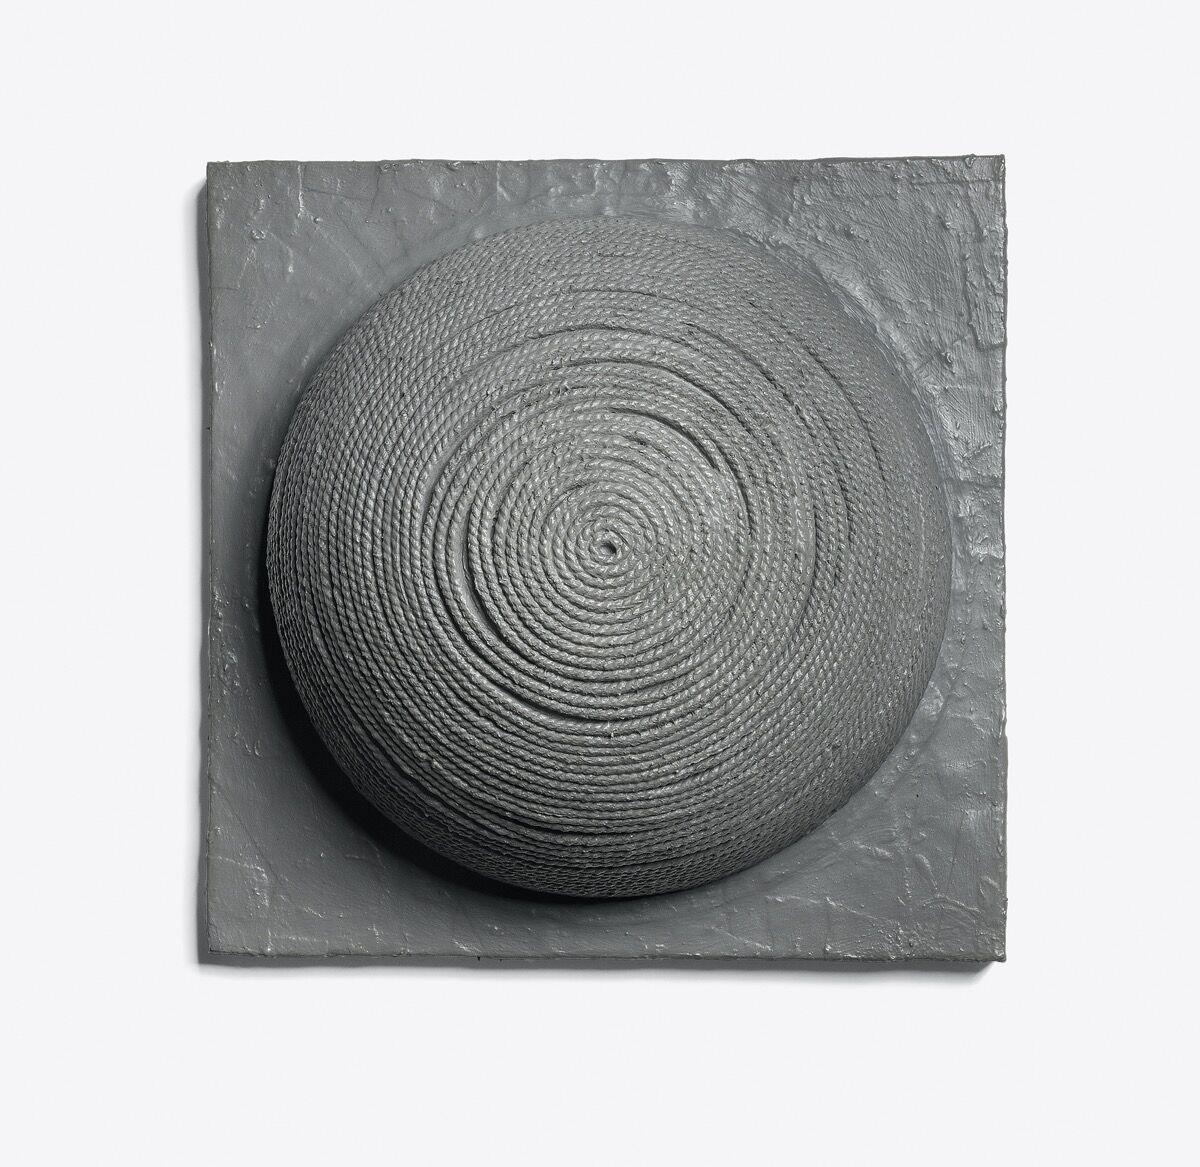 Eva Hesse, No title, 1966. Courtesy of Acquavella Galleries.